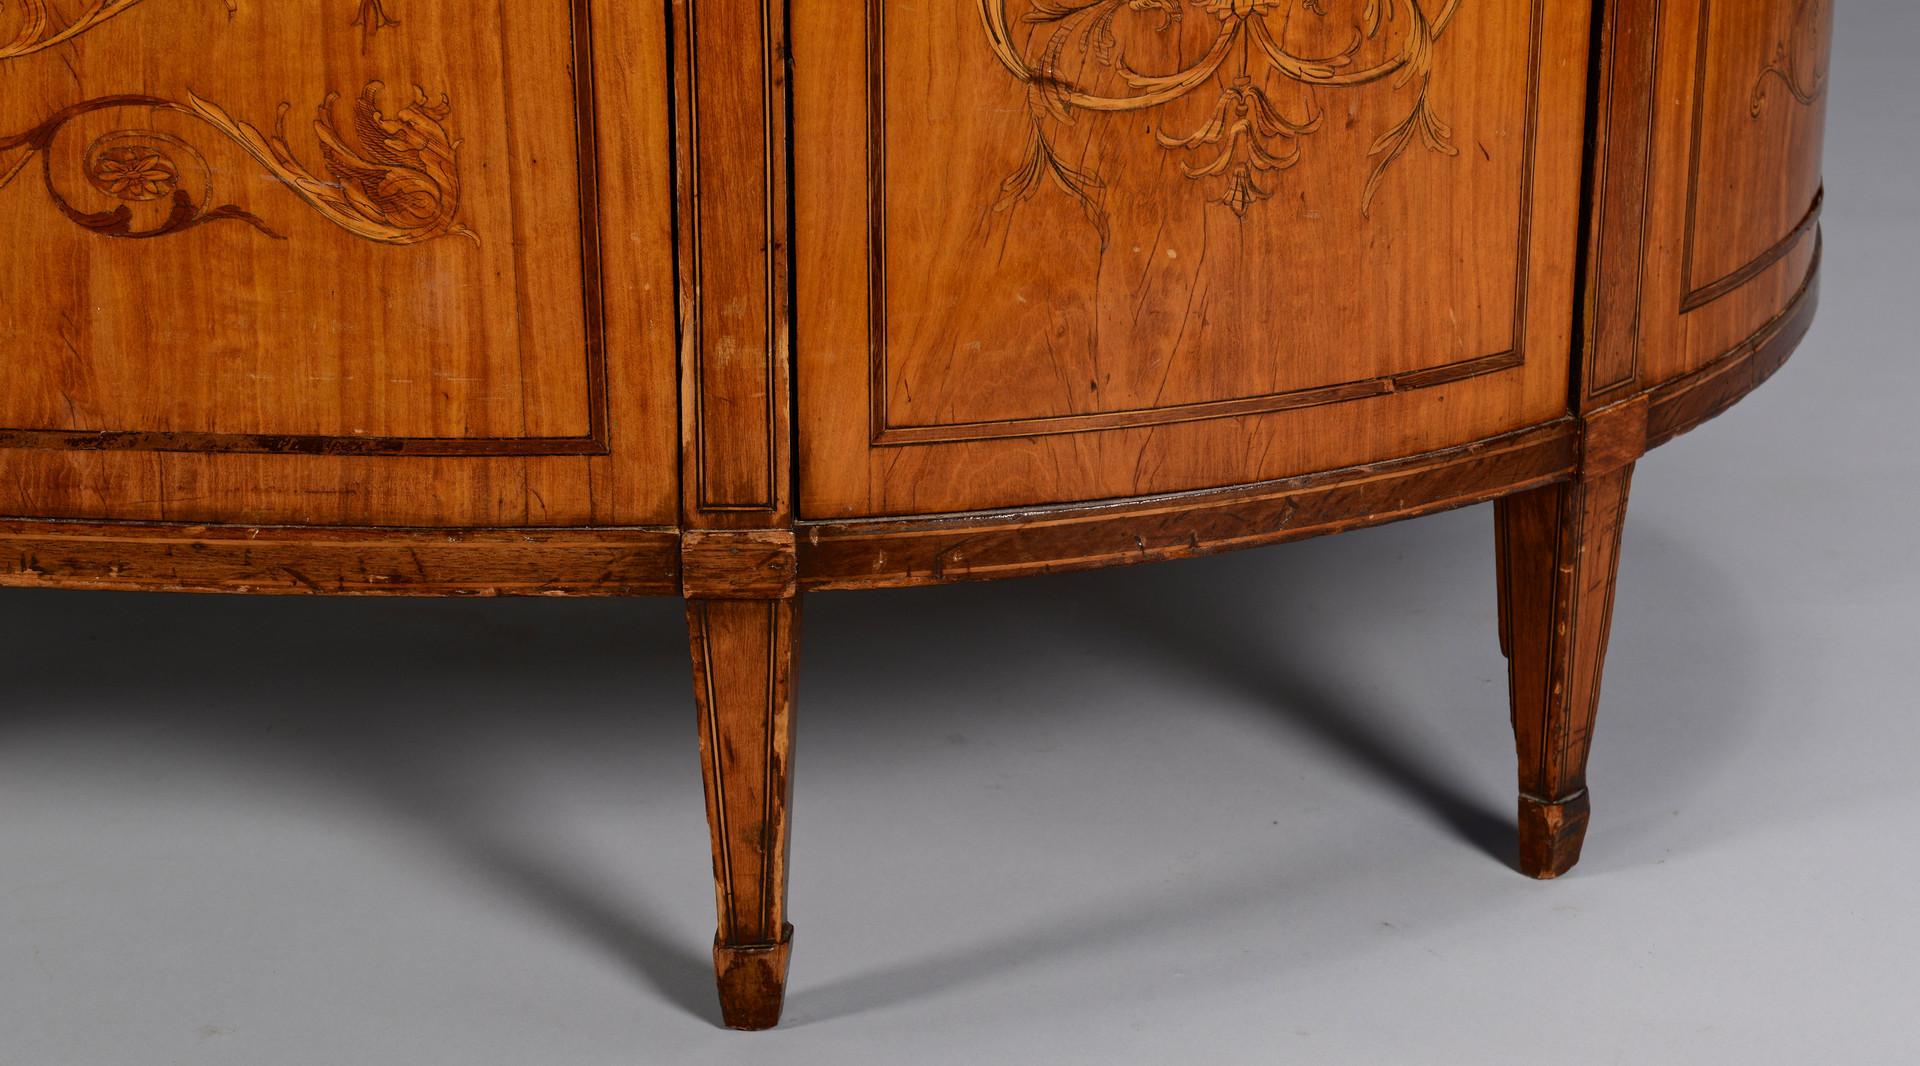 Lot 150: Adam Style Marquetry Desk